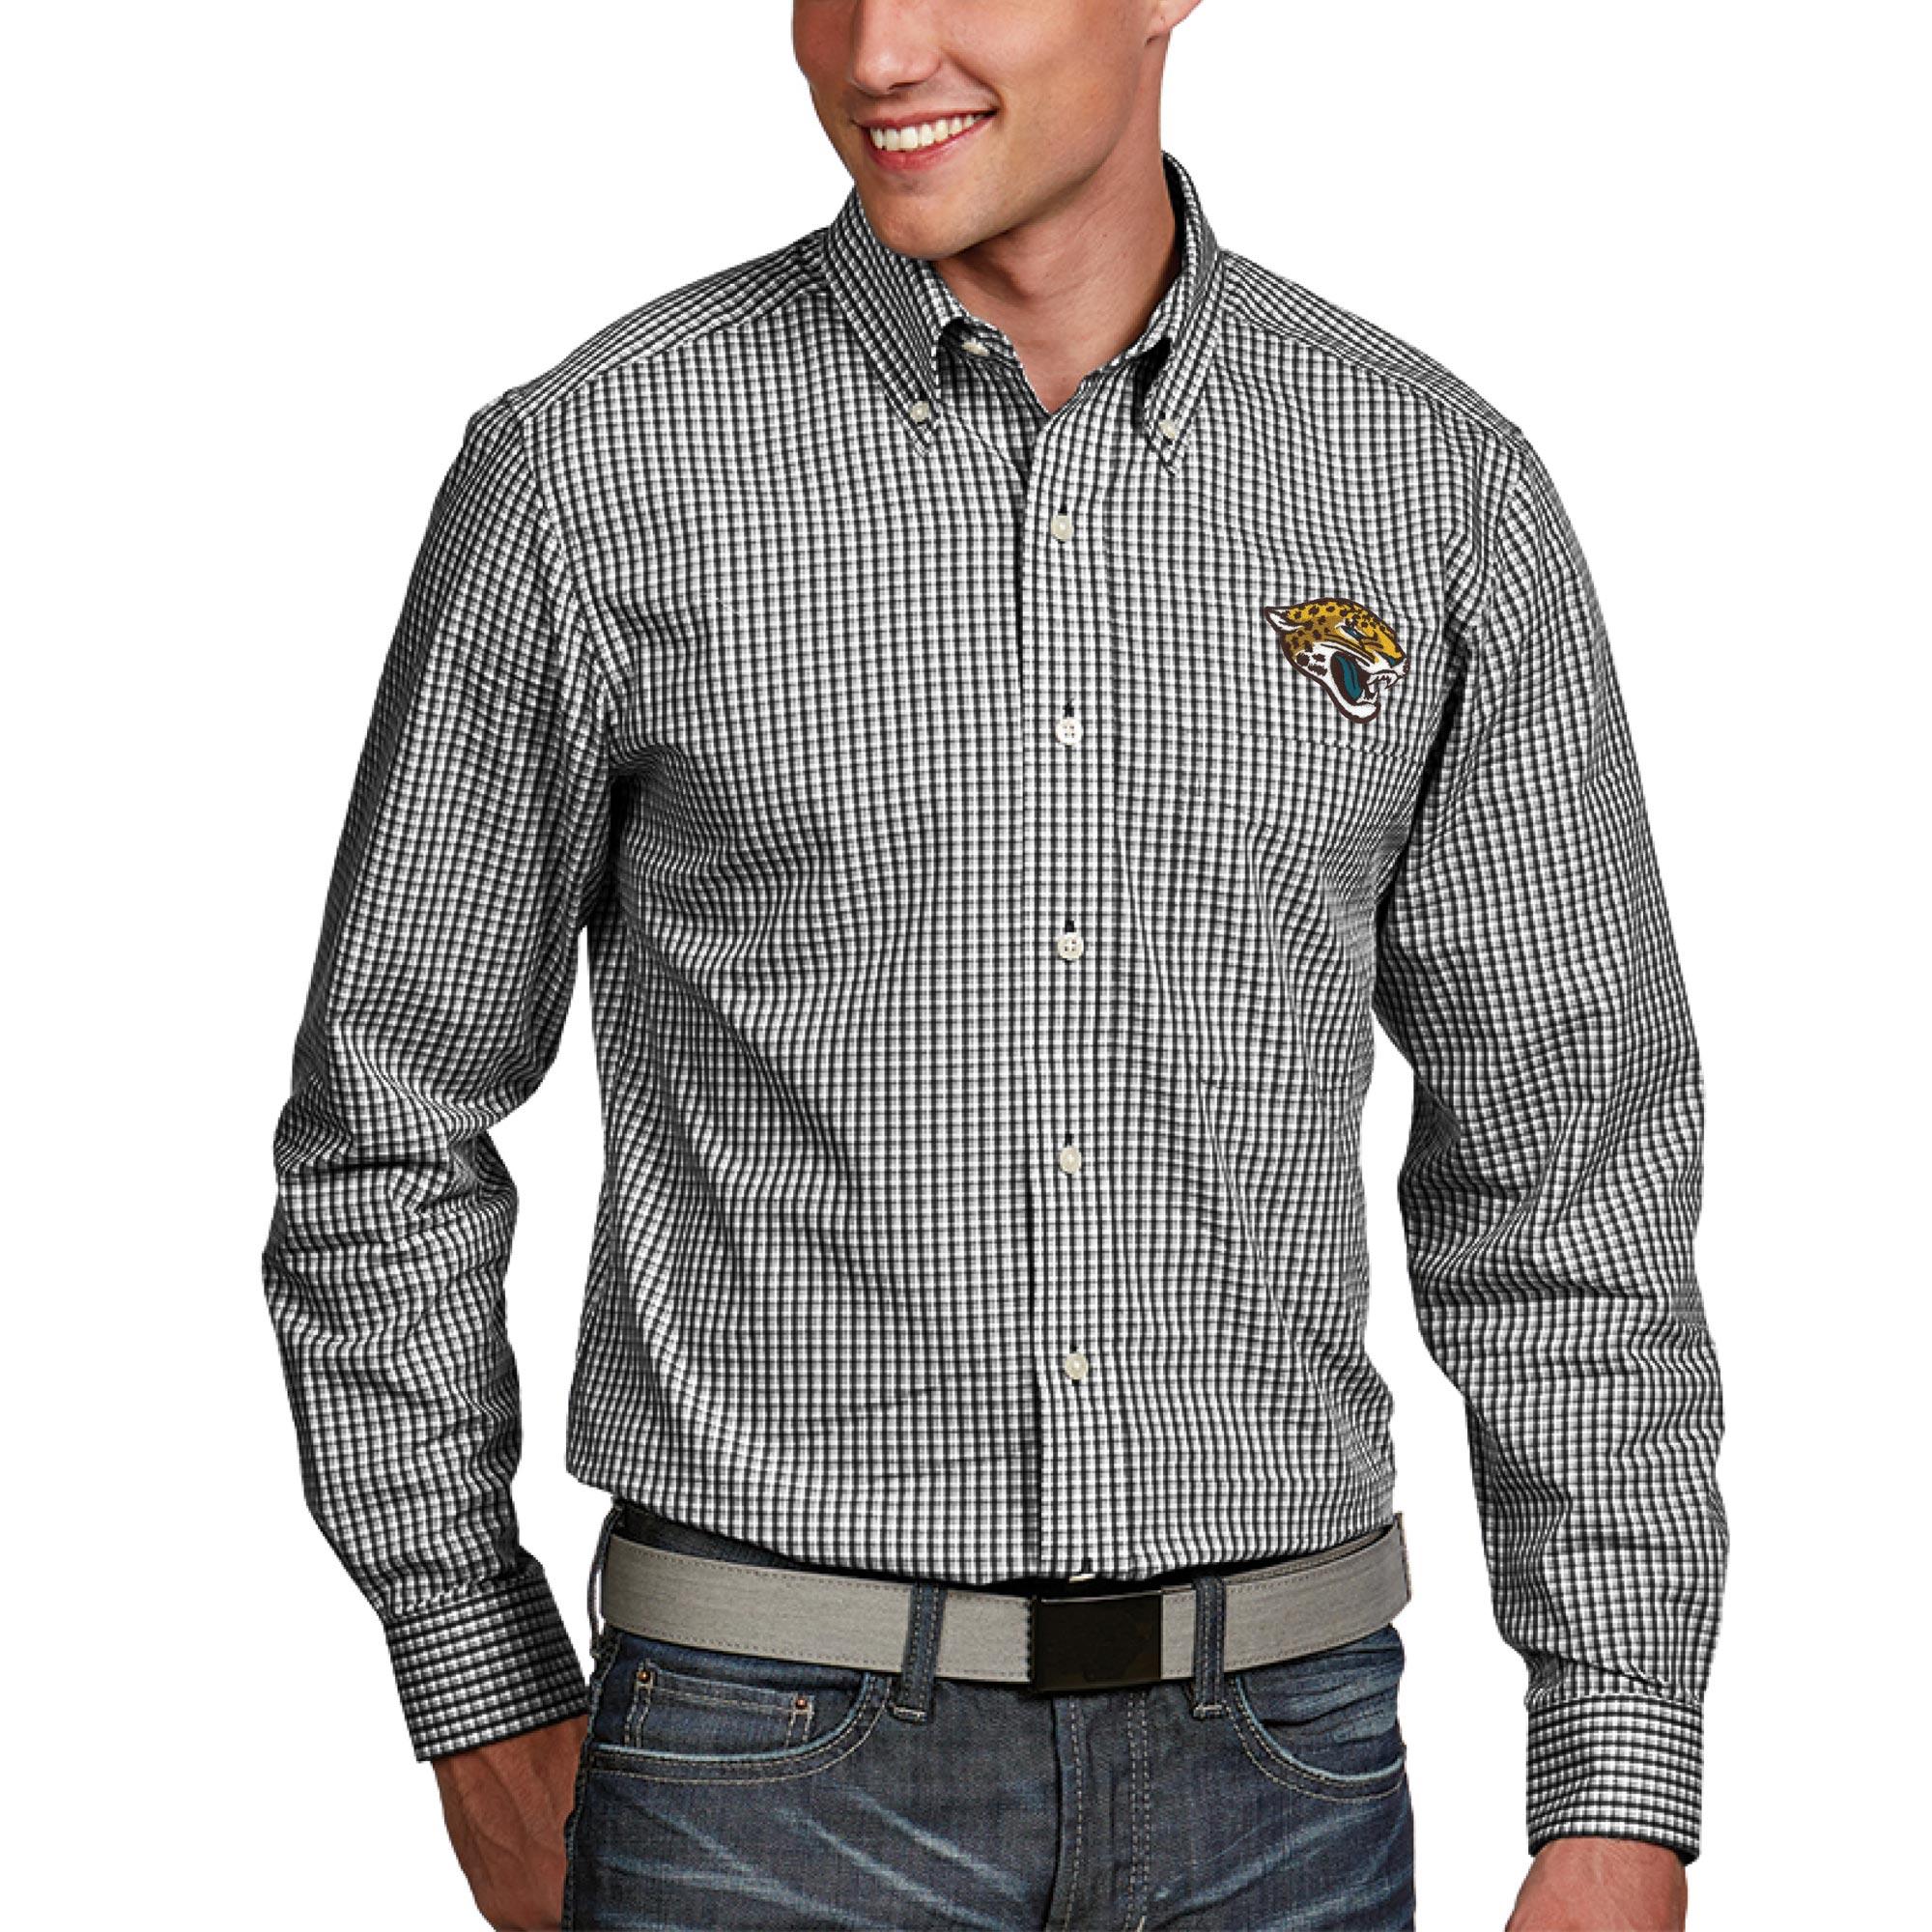 Jacksonville Jaguars Antigua Associate Woven Long Sleeve Button-Down Shirt - Black